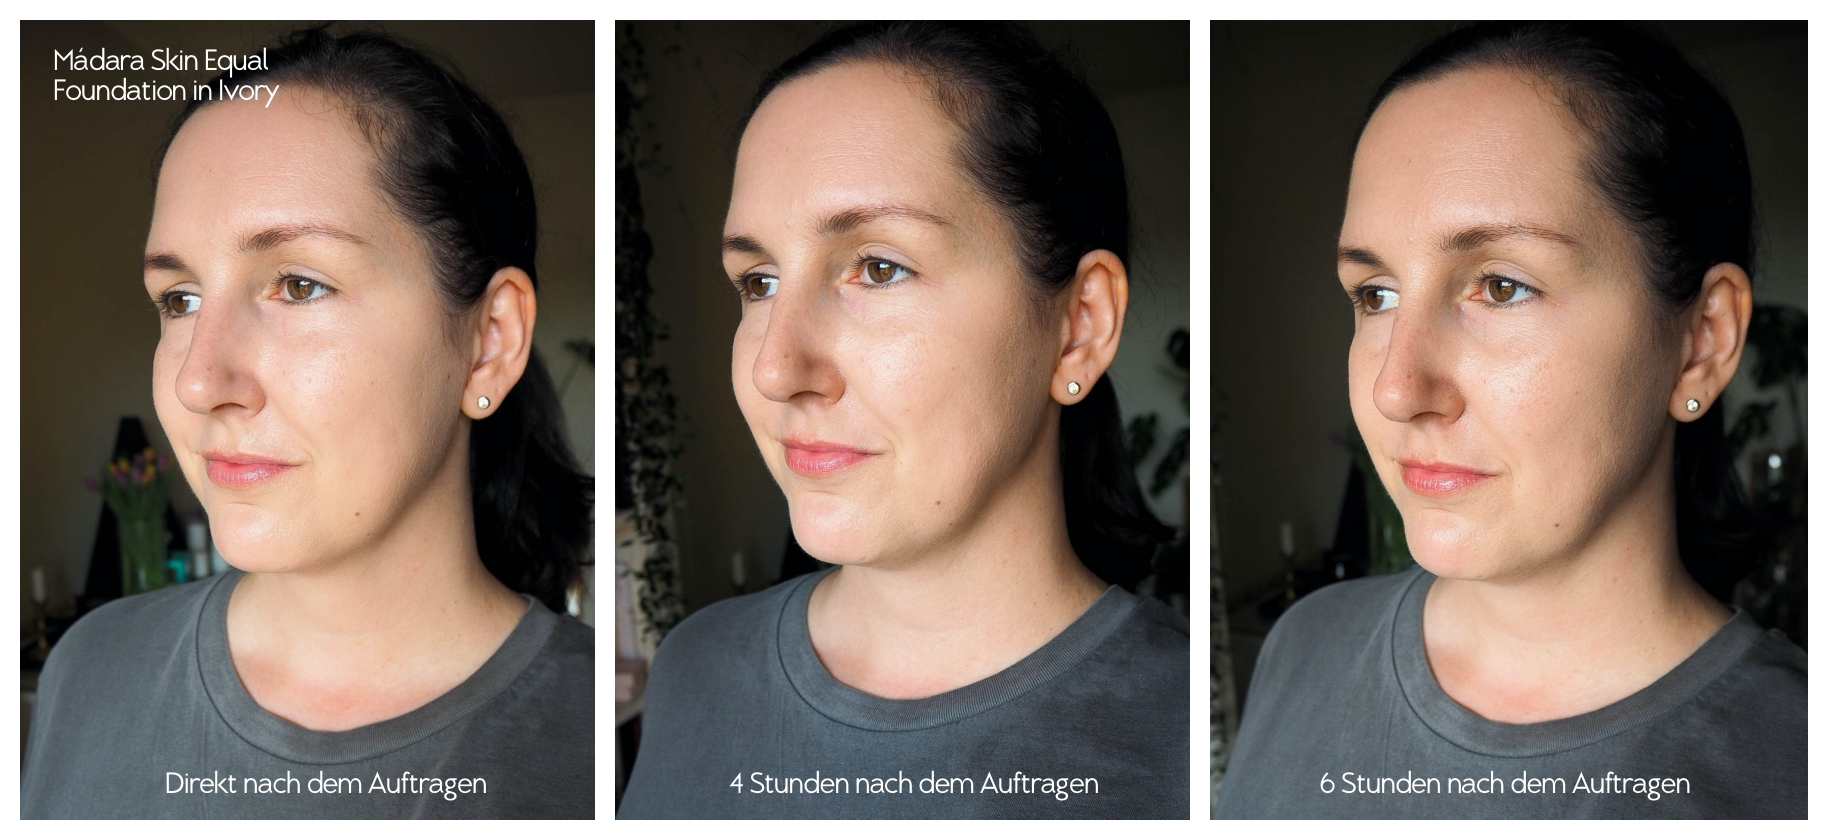 Mádara Skin Equal Skin Foundation Wear Test Review